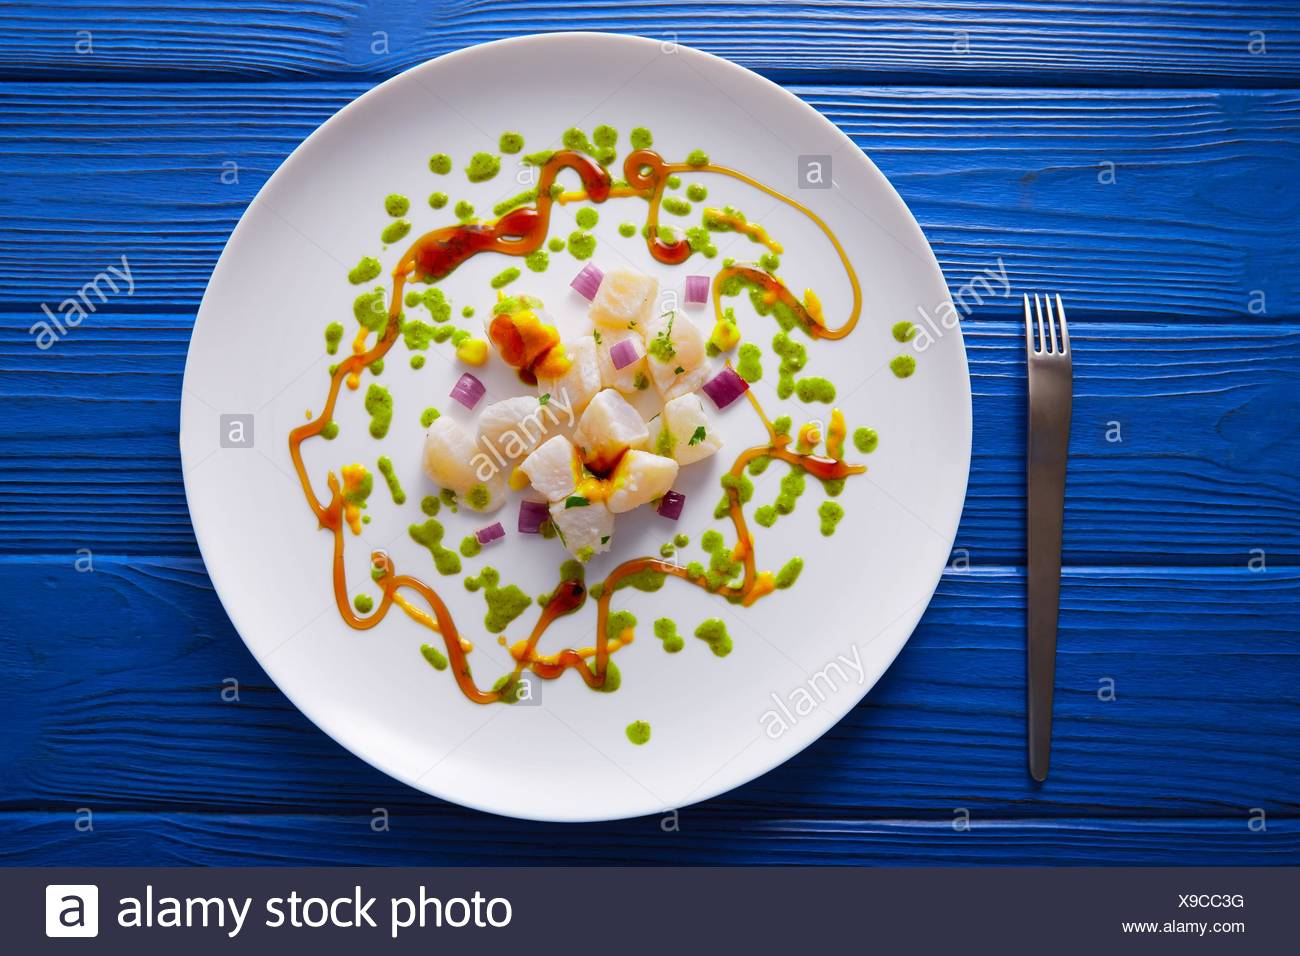 Ceviche rezept moderne gastronomie stil molekulare küche stockfoto